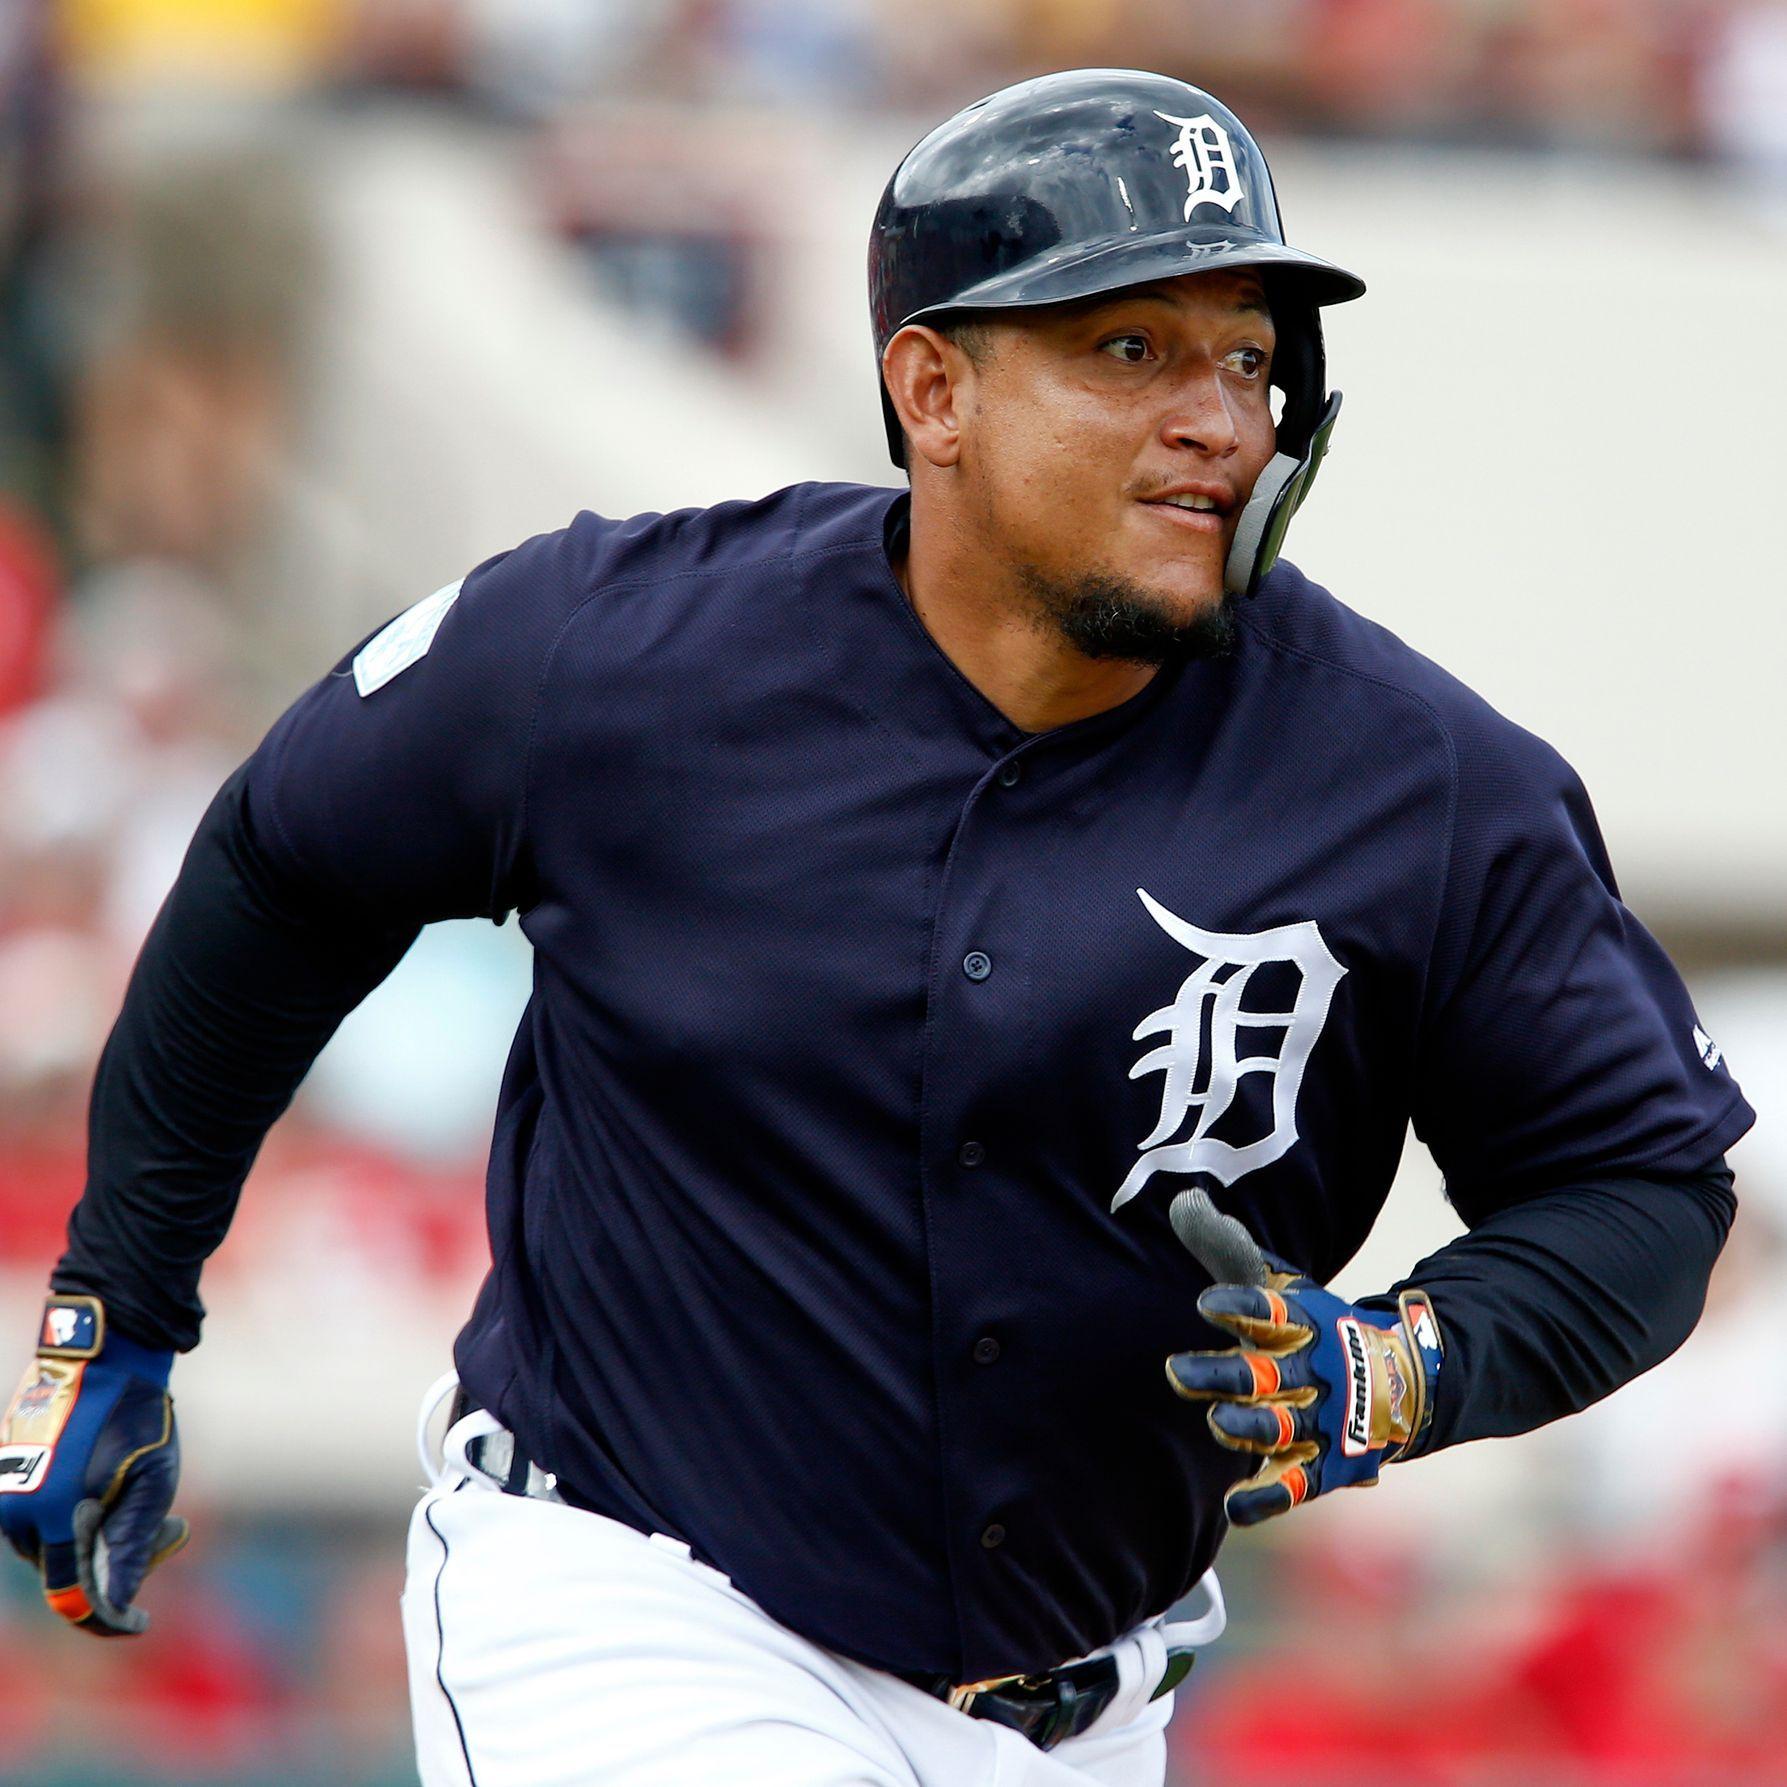 Talkin' Tigers: Dan Dickerson and Matt Shepard preview the 2019 season